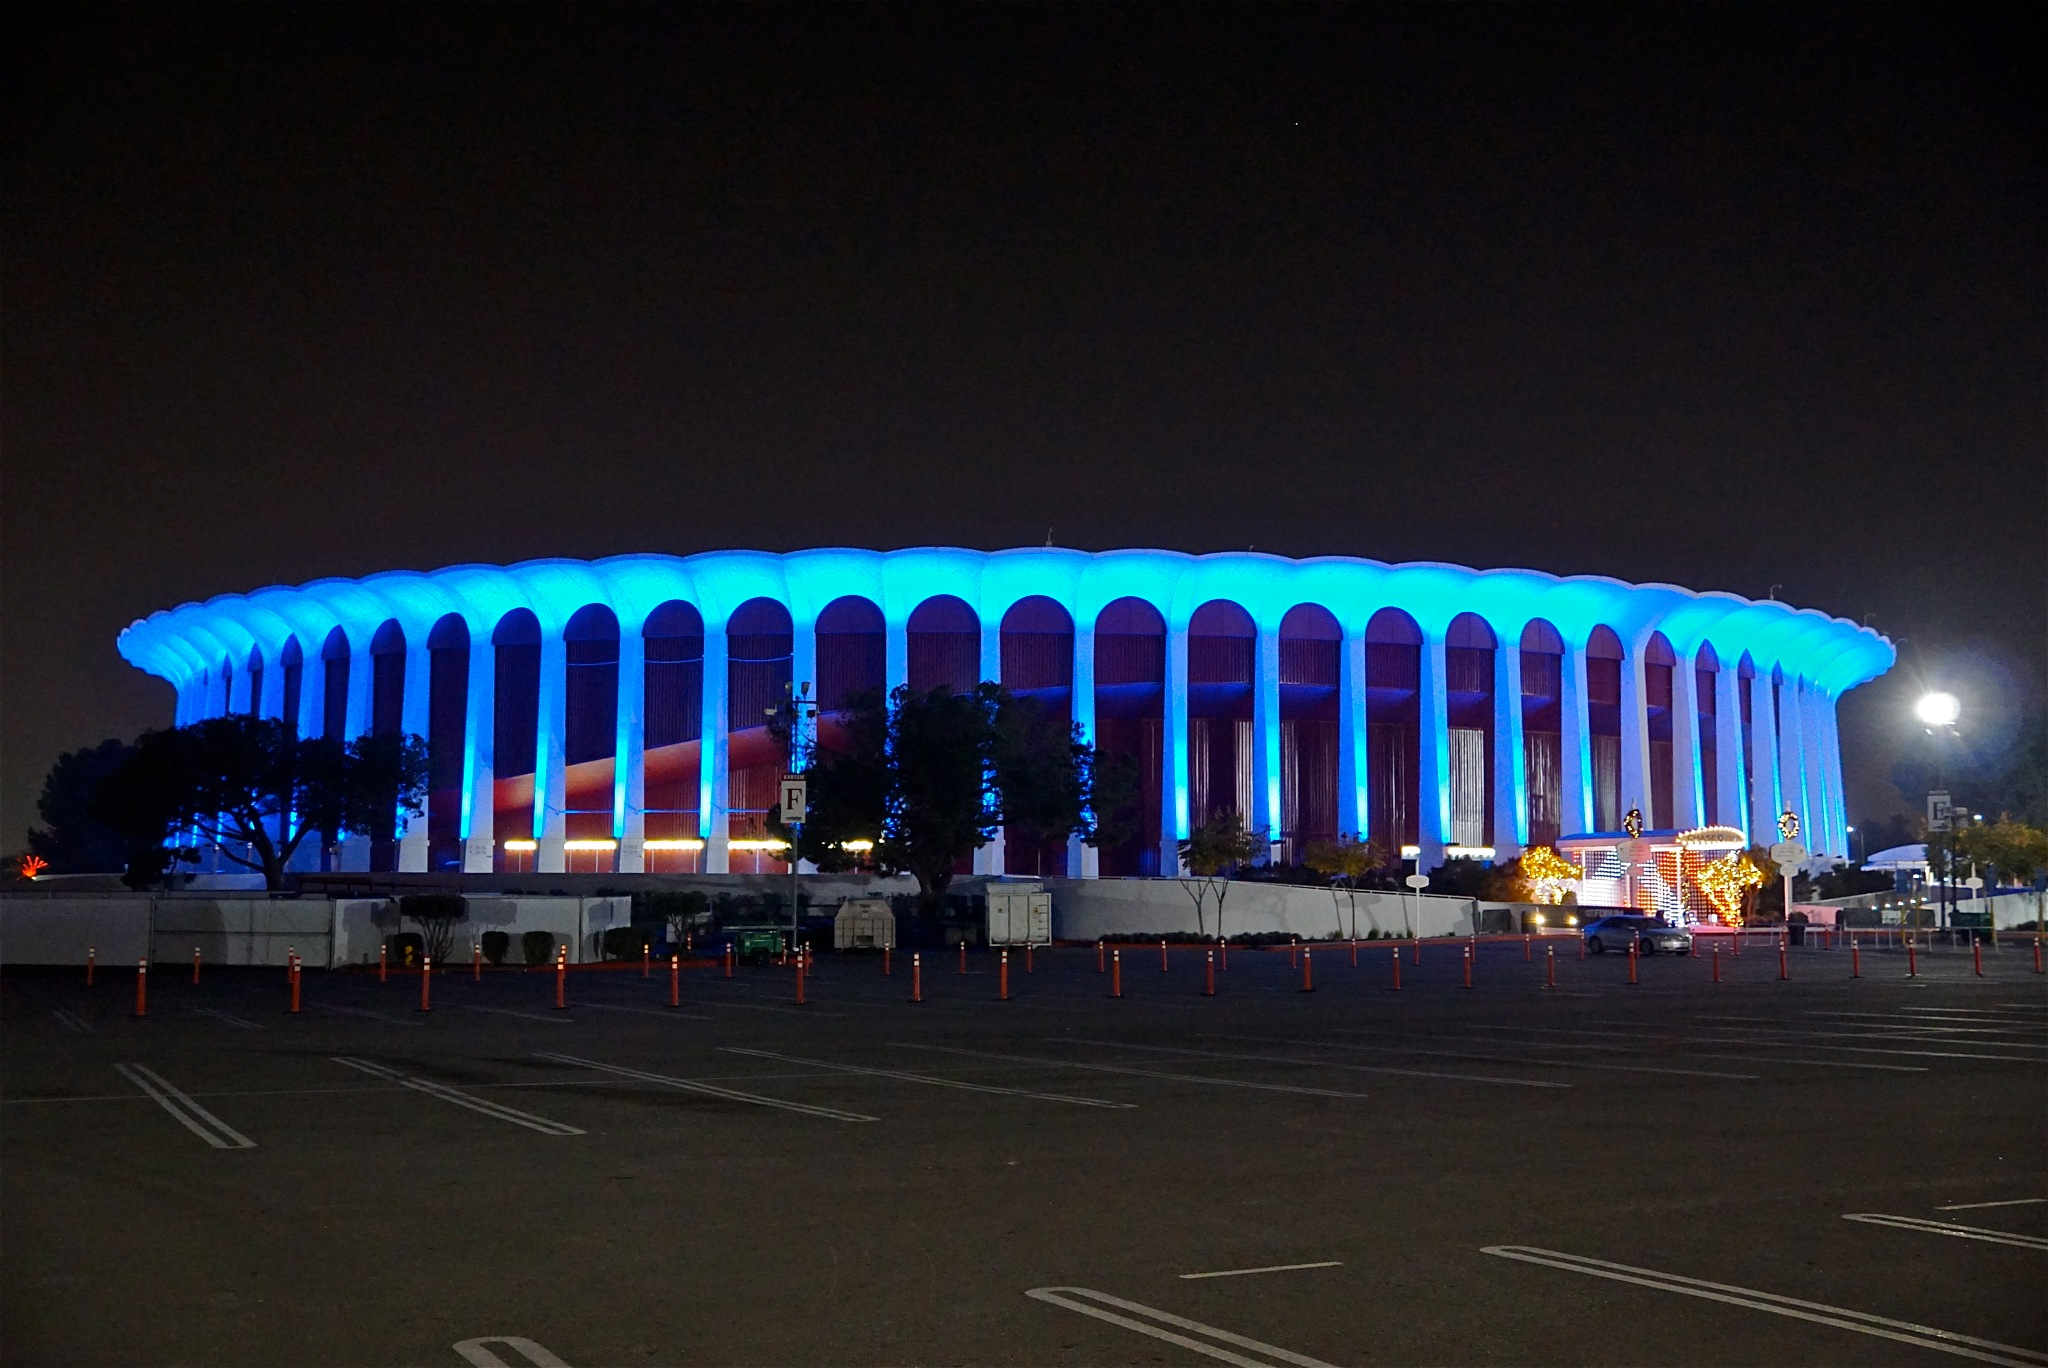 Forum, in blue by Debi Staron